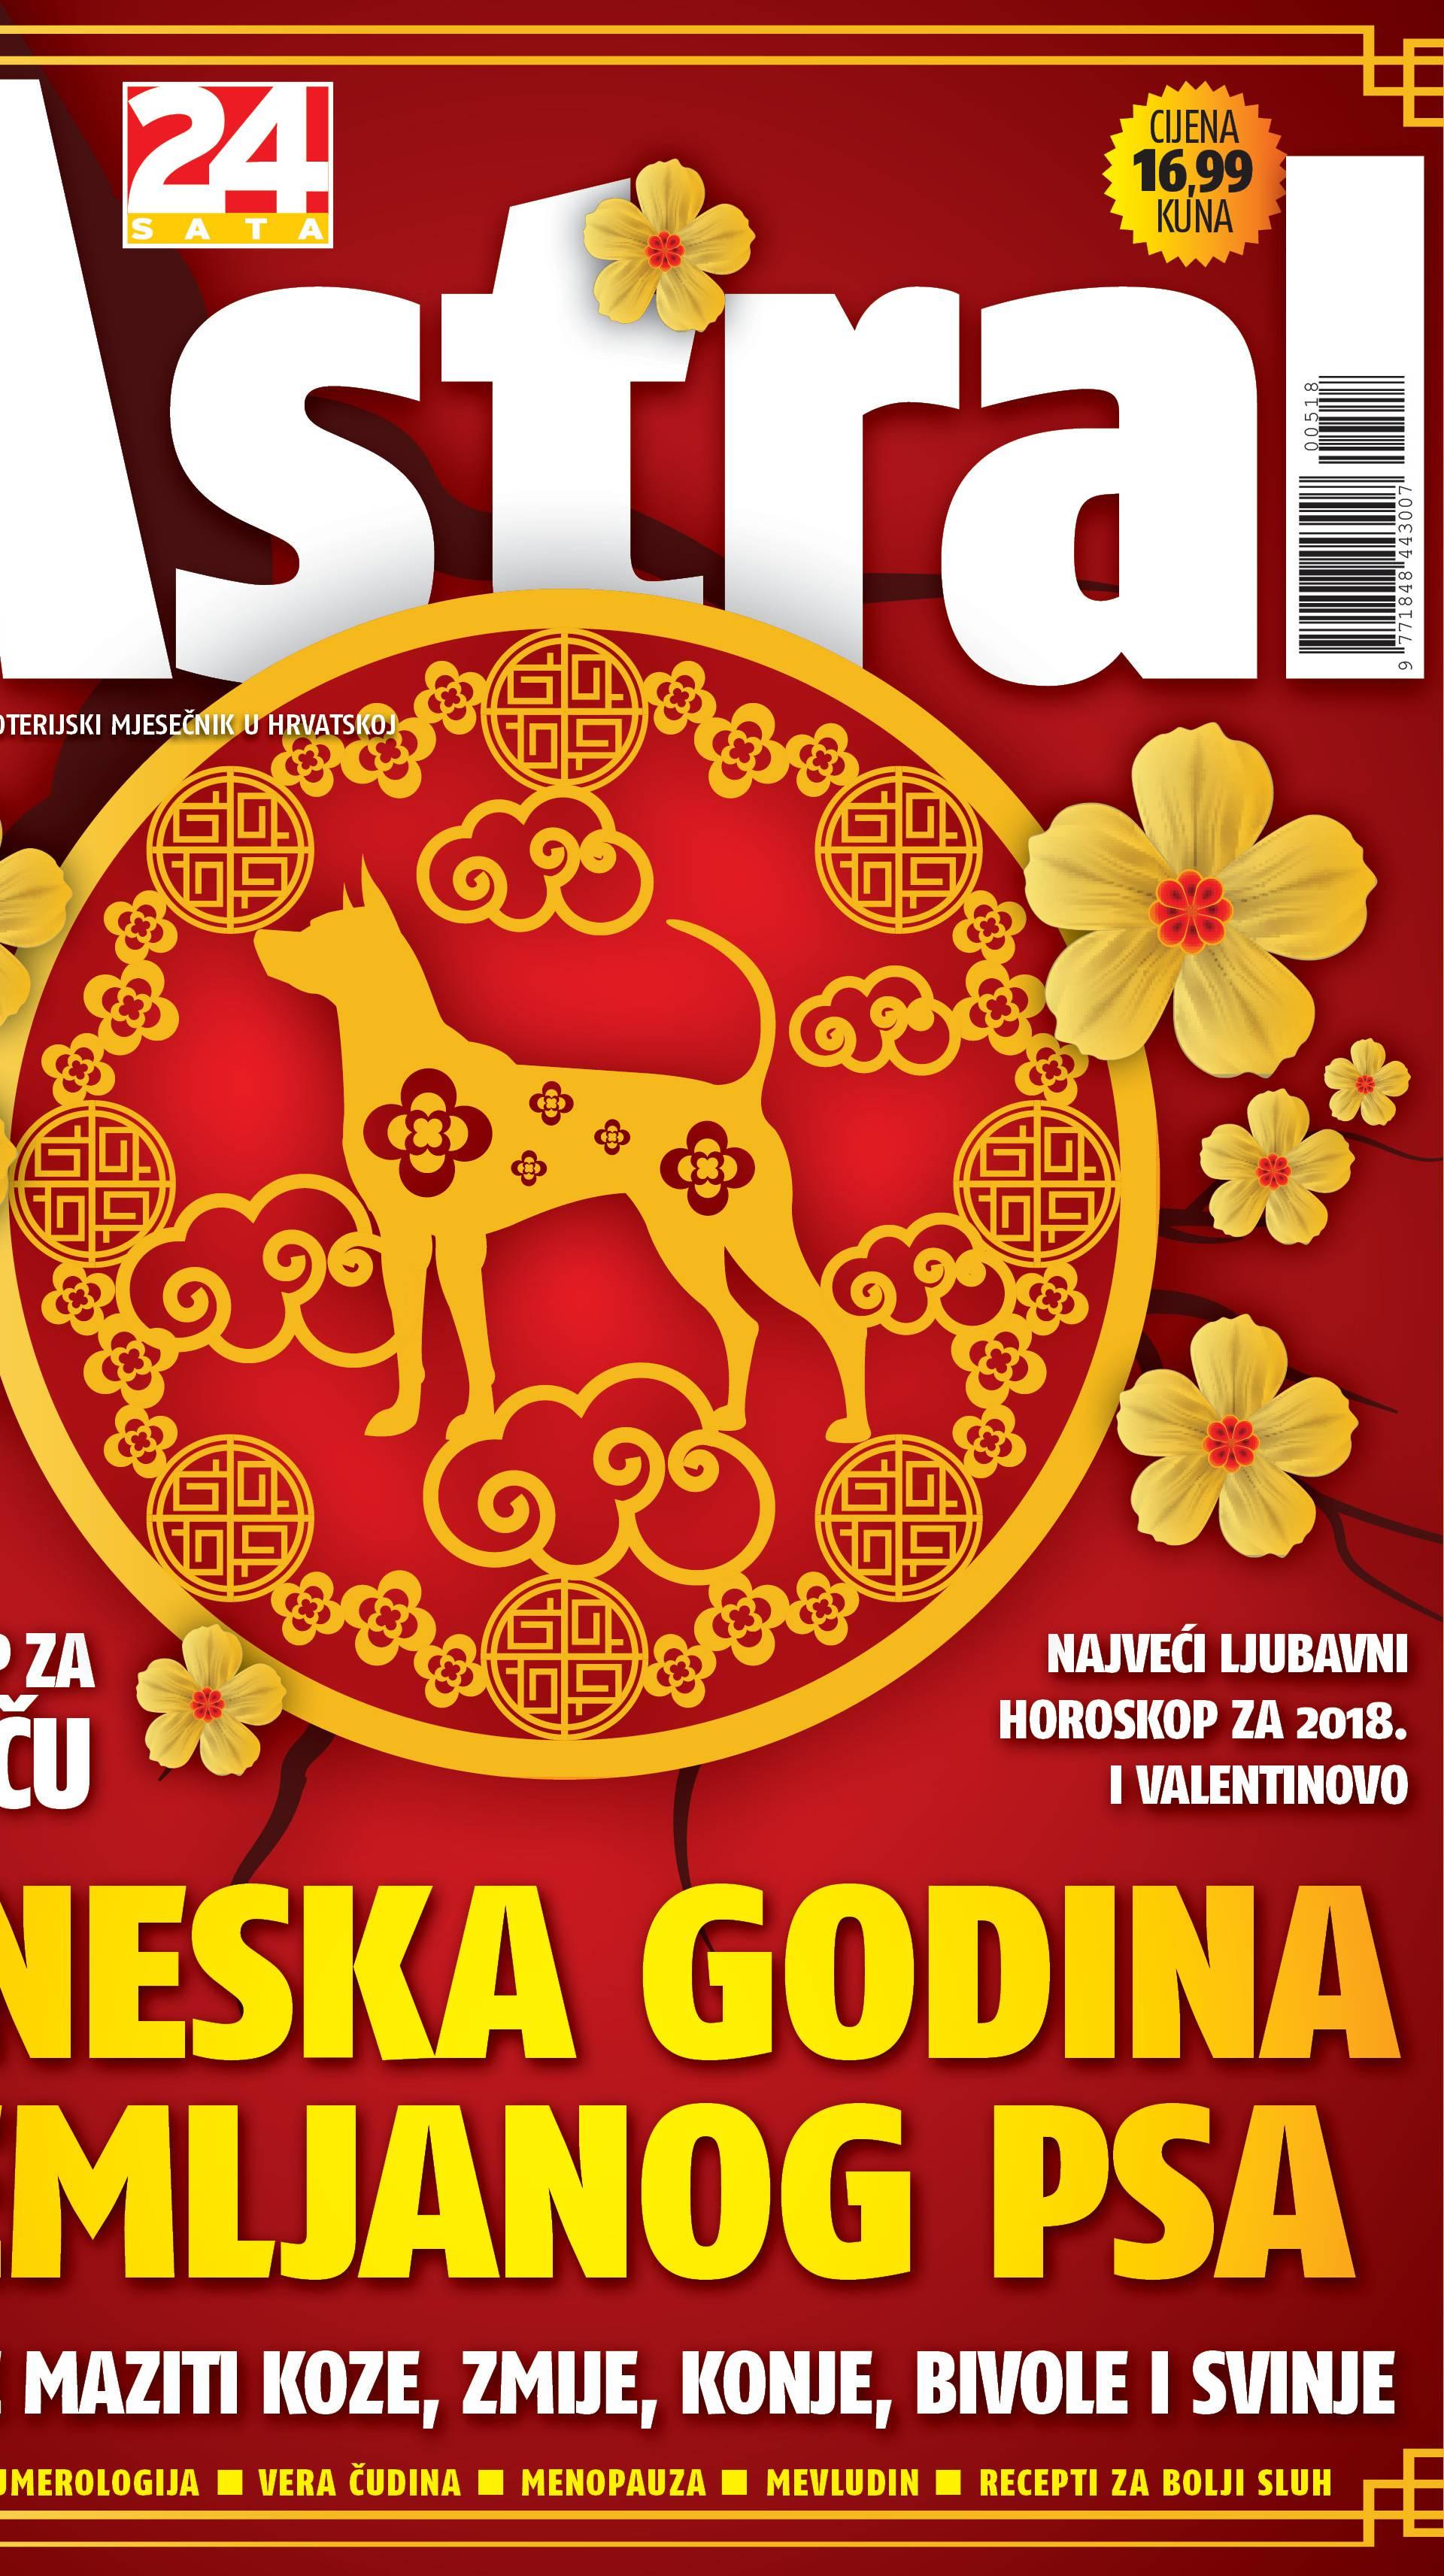 Astral: Analiza kineske godine Zemljanog psa i veliki horoskop